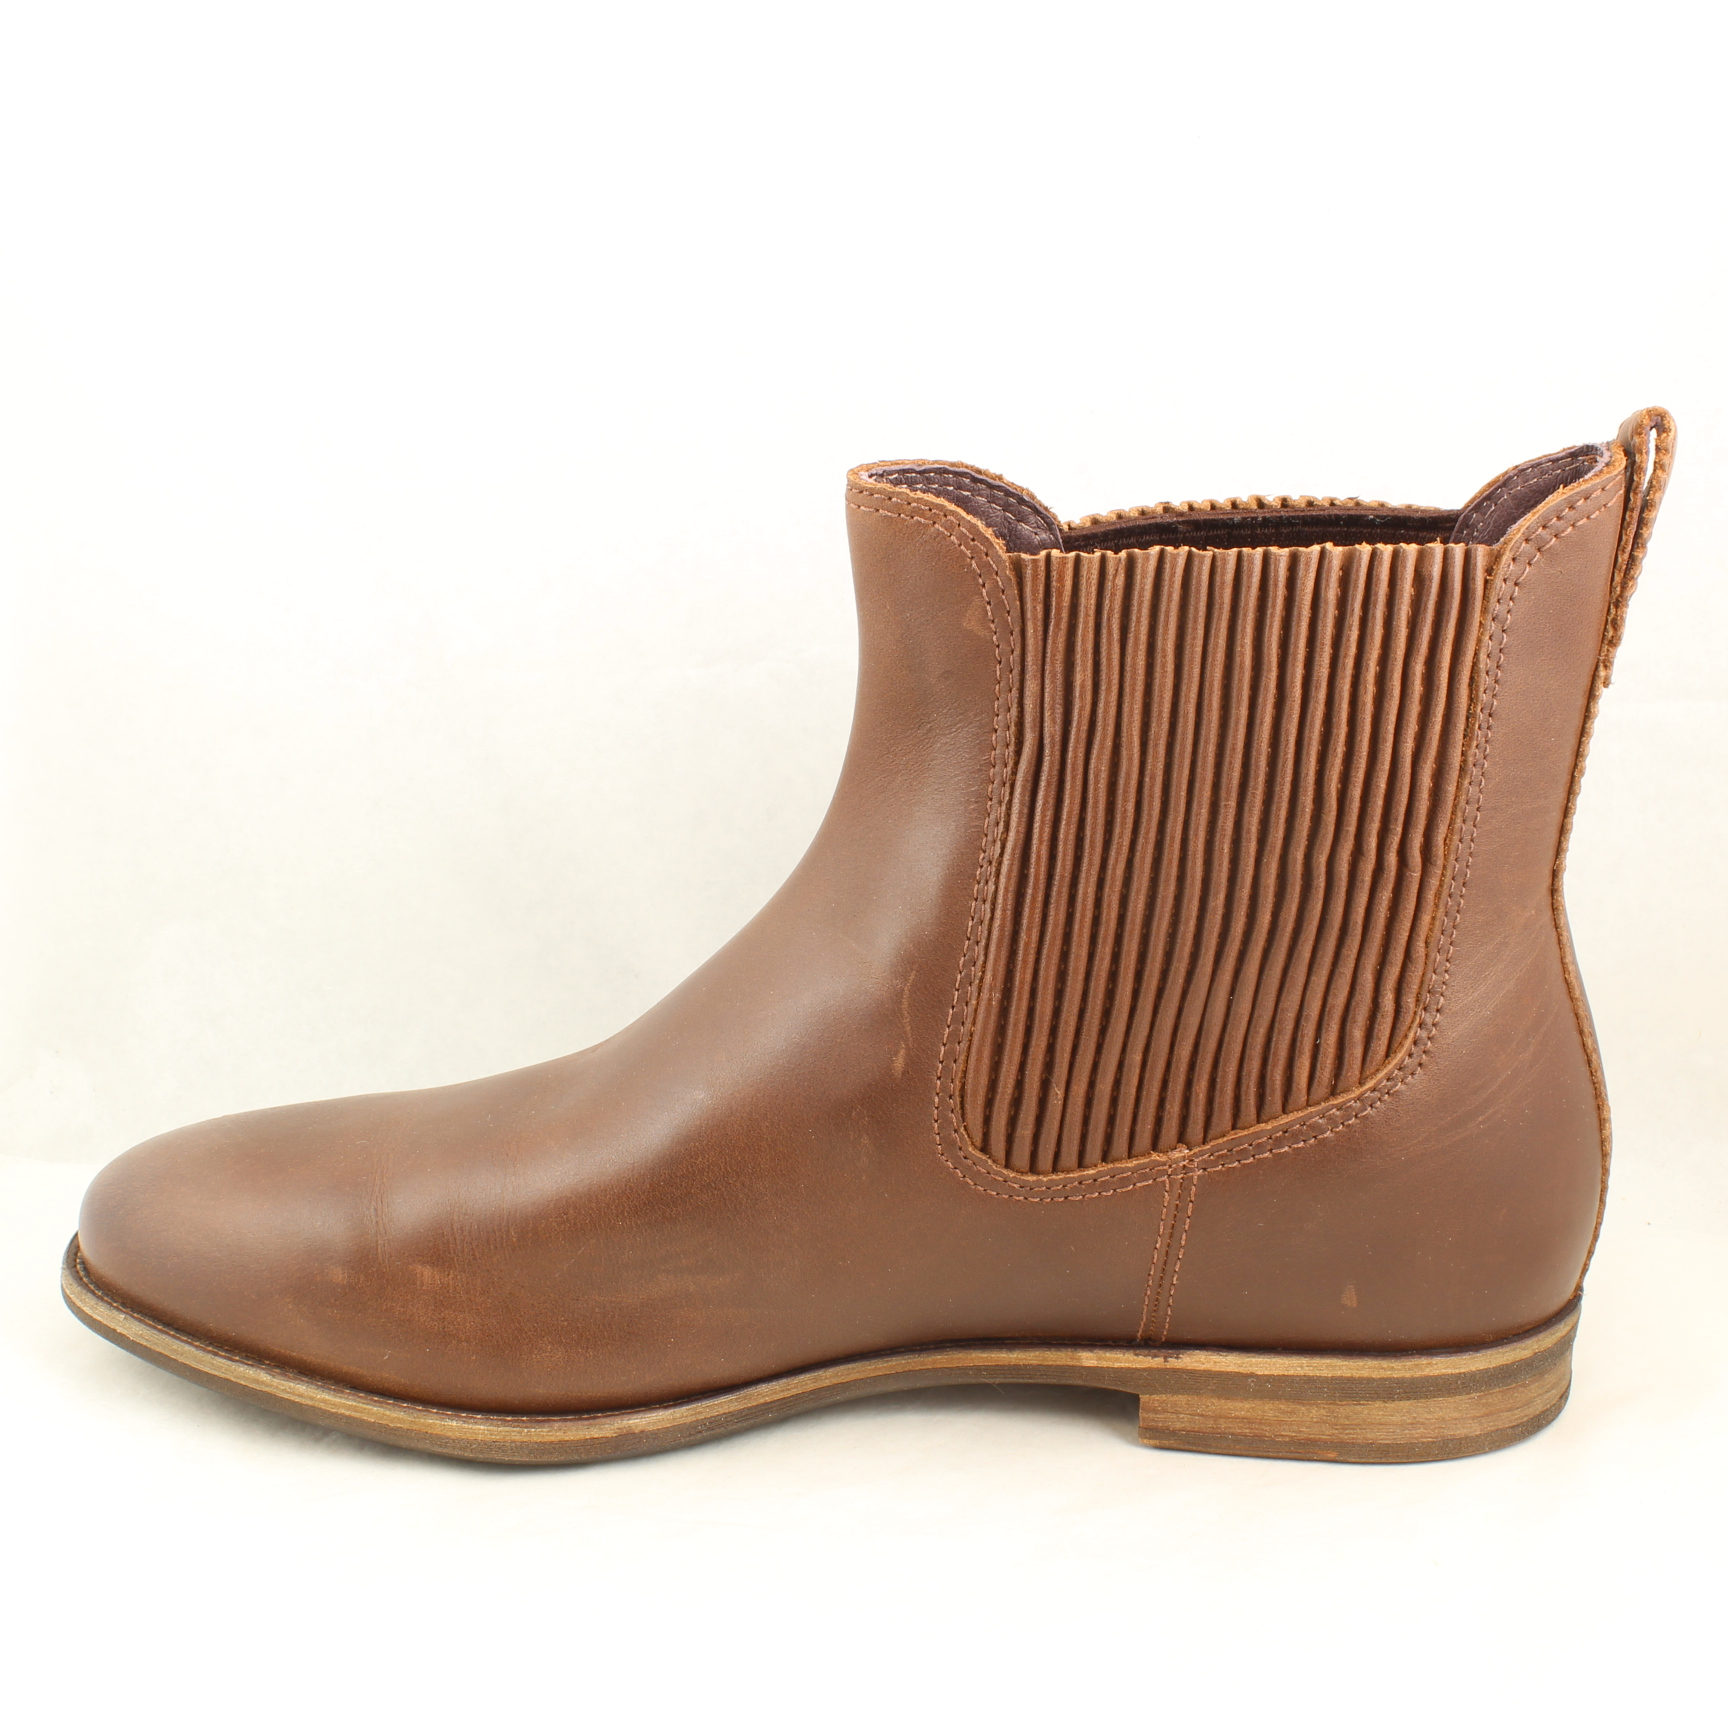 Brilliant  Leather Clarks GELATA ITALIA Brown Shoes Ankle Boots Women UK KO5CYP5J